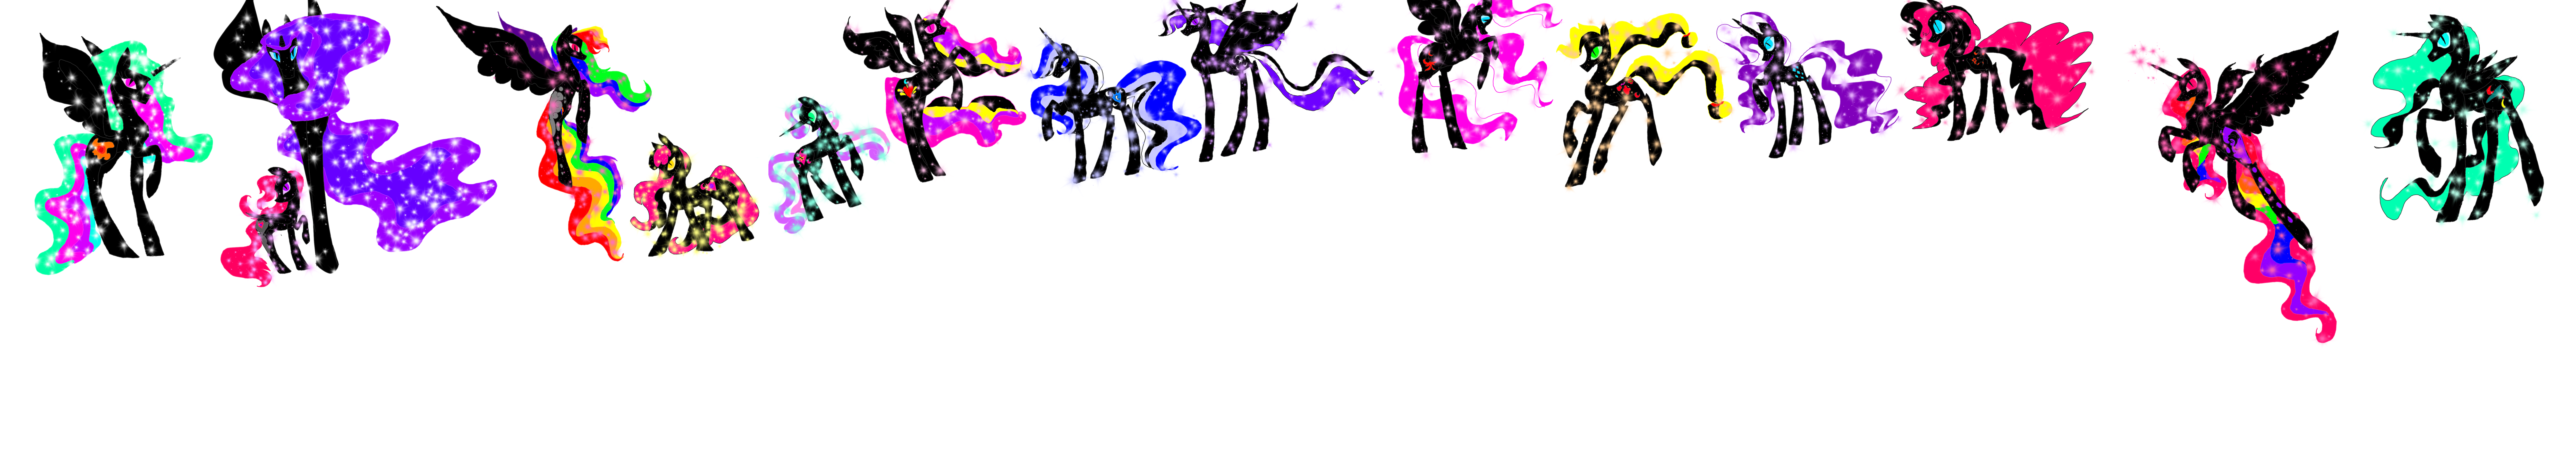 Nightmare Ponies by LynnTV on DeviantArt